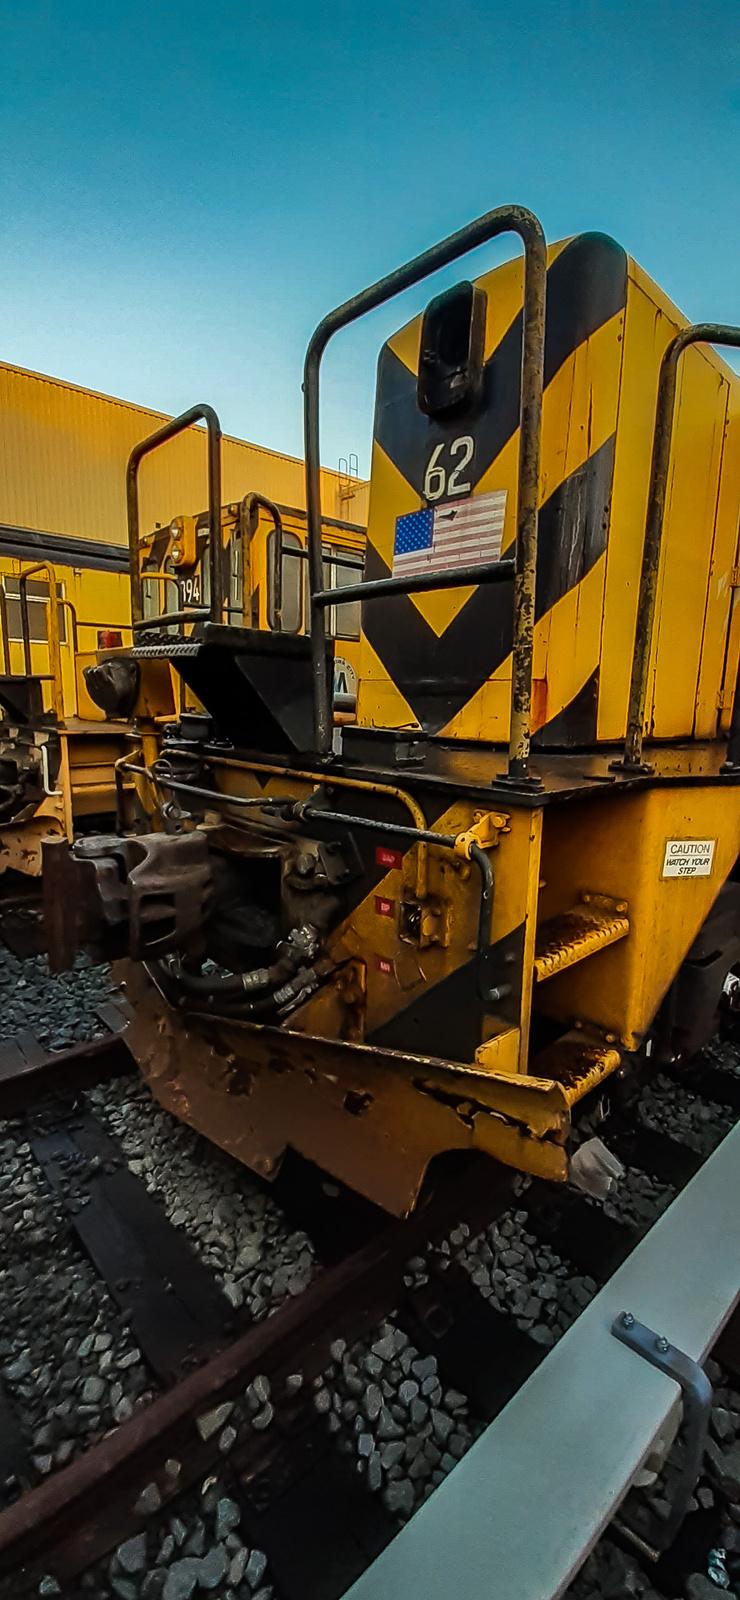 (203k, 820x556)<br><b>Country:</b> United States<br><b>City:</b> New York<br><b>System:</b> New York City Transit<br><b>Location:</b> Coney Island Yard<br><b>Car:</b> R-32 (Budd, 1964)  3662 <br><b>Photo by:</b> Joel Shanus<br><b>Viewed (this week/total):</b> 0 / 1680